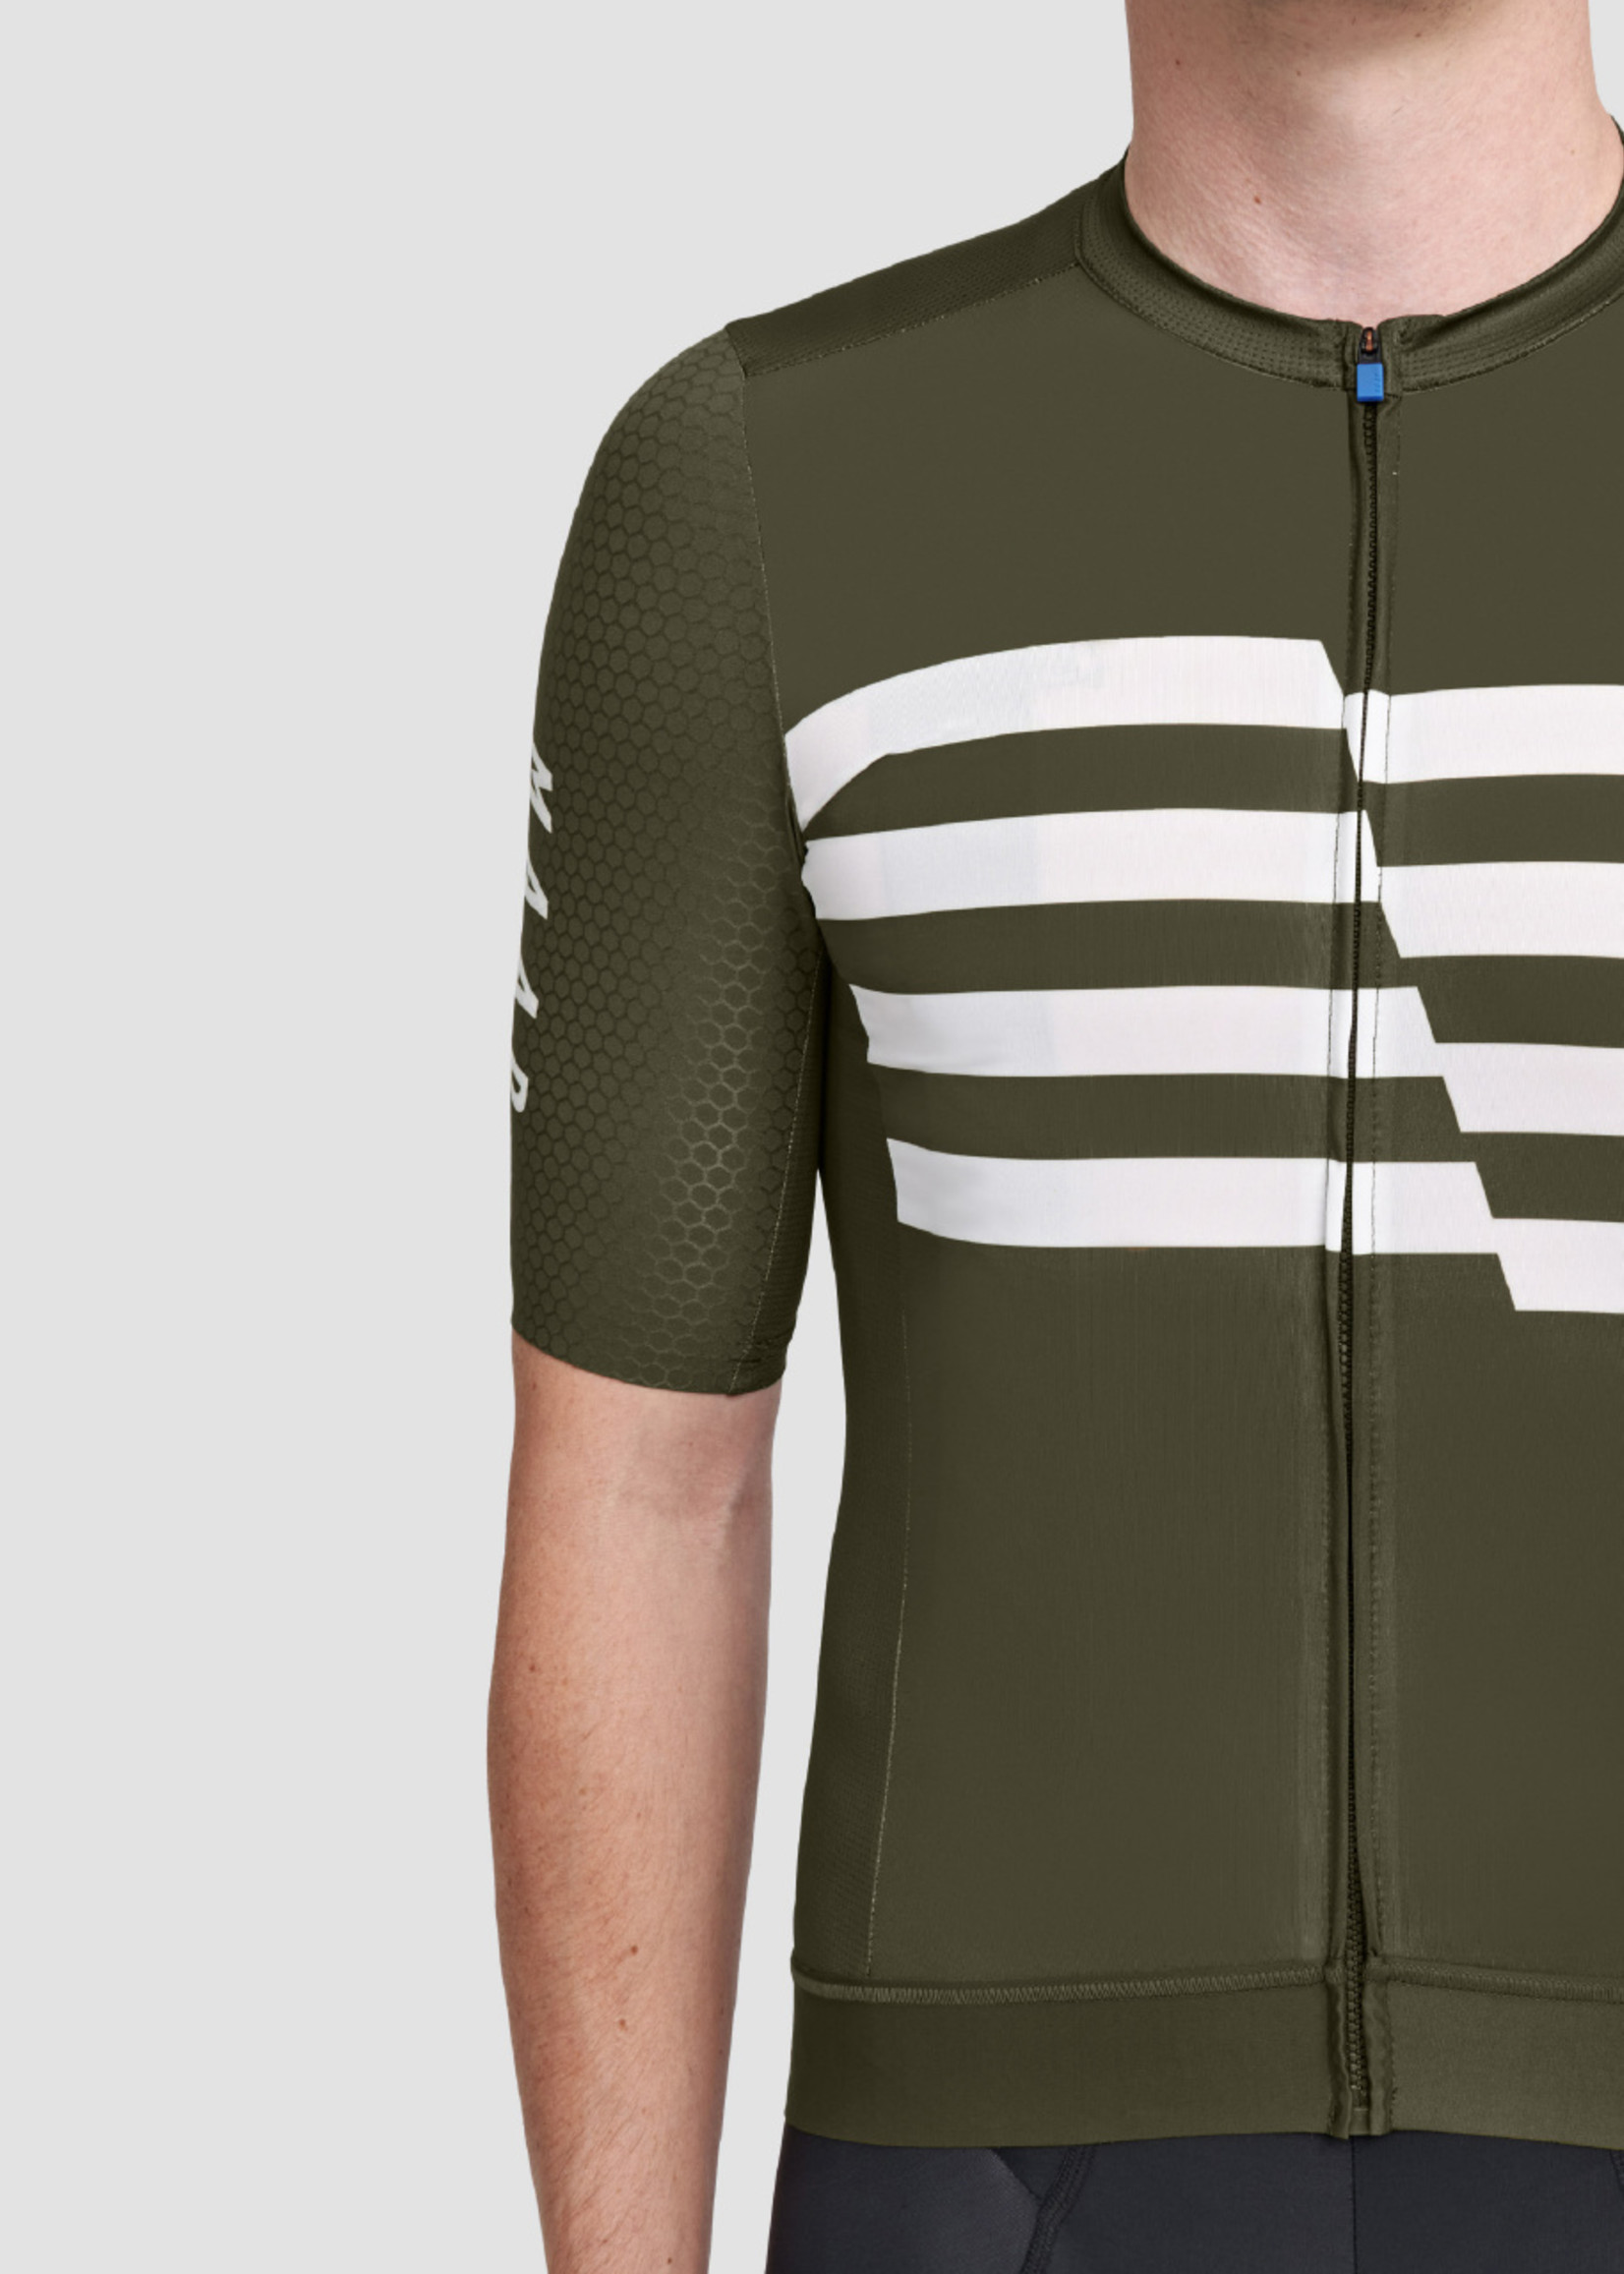 Maap Emblem Pro Hex Jersey - Olive